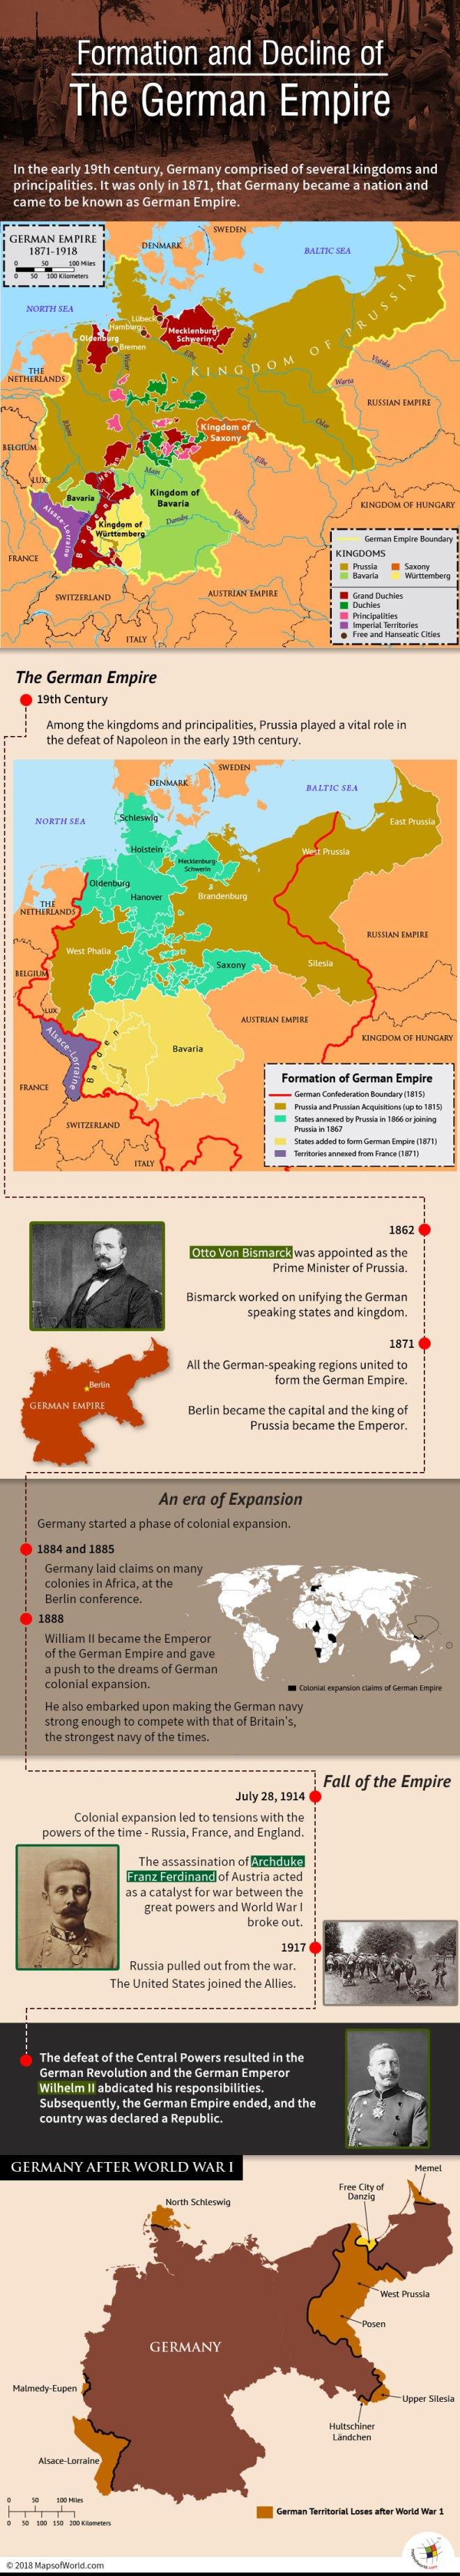 Infographic elaborating history of Germany